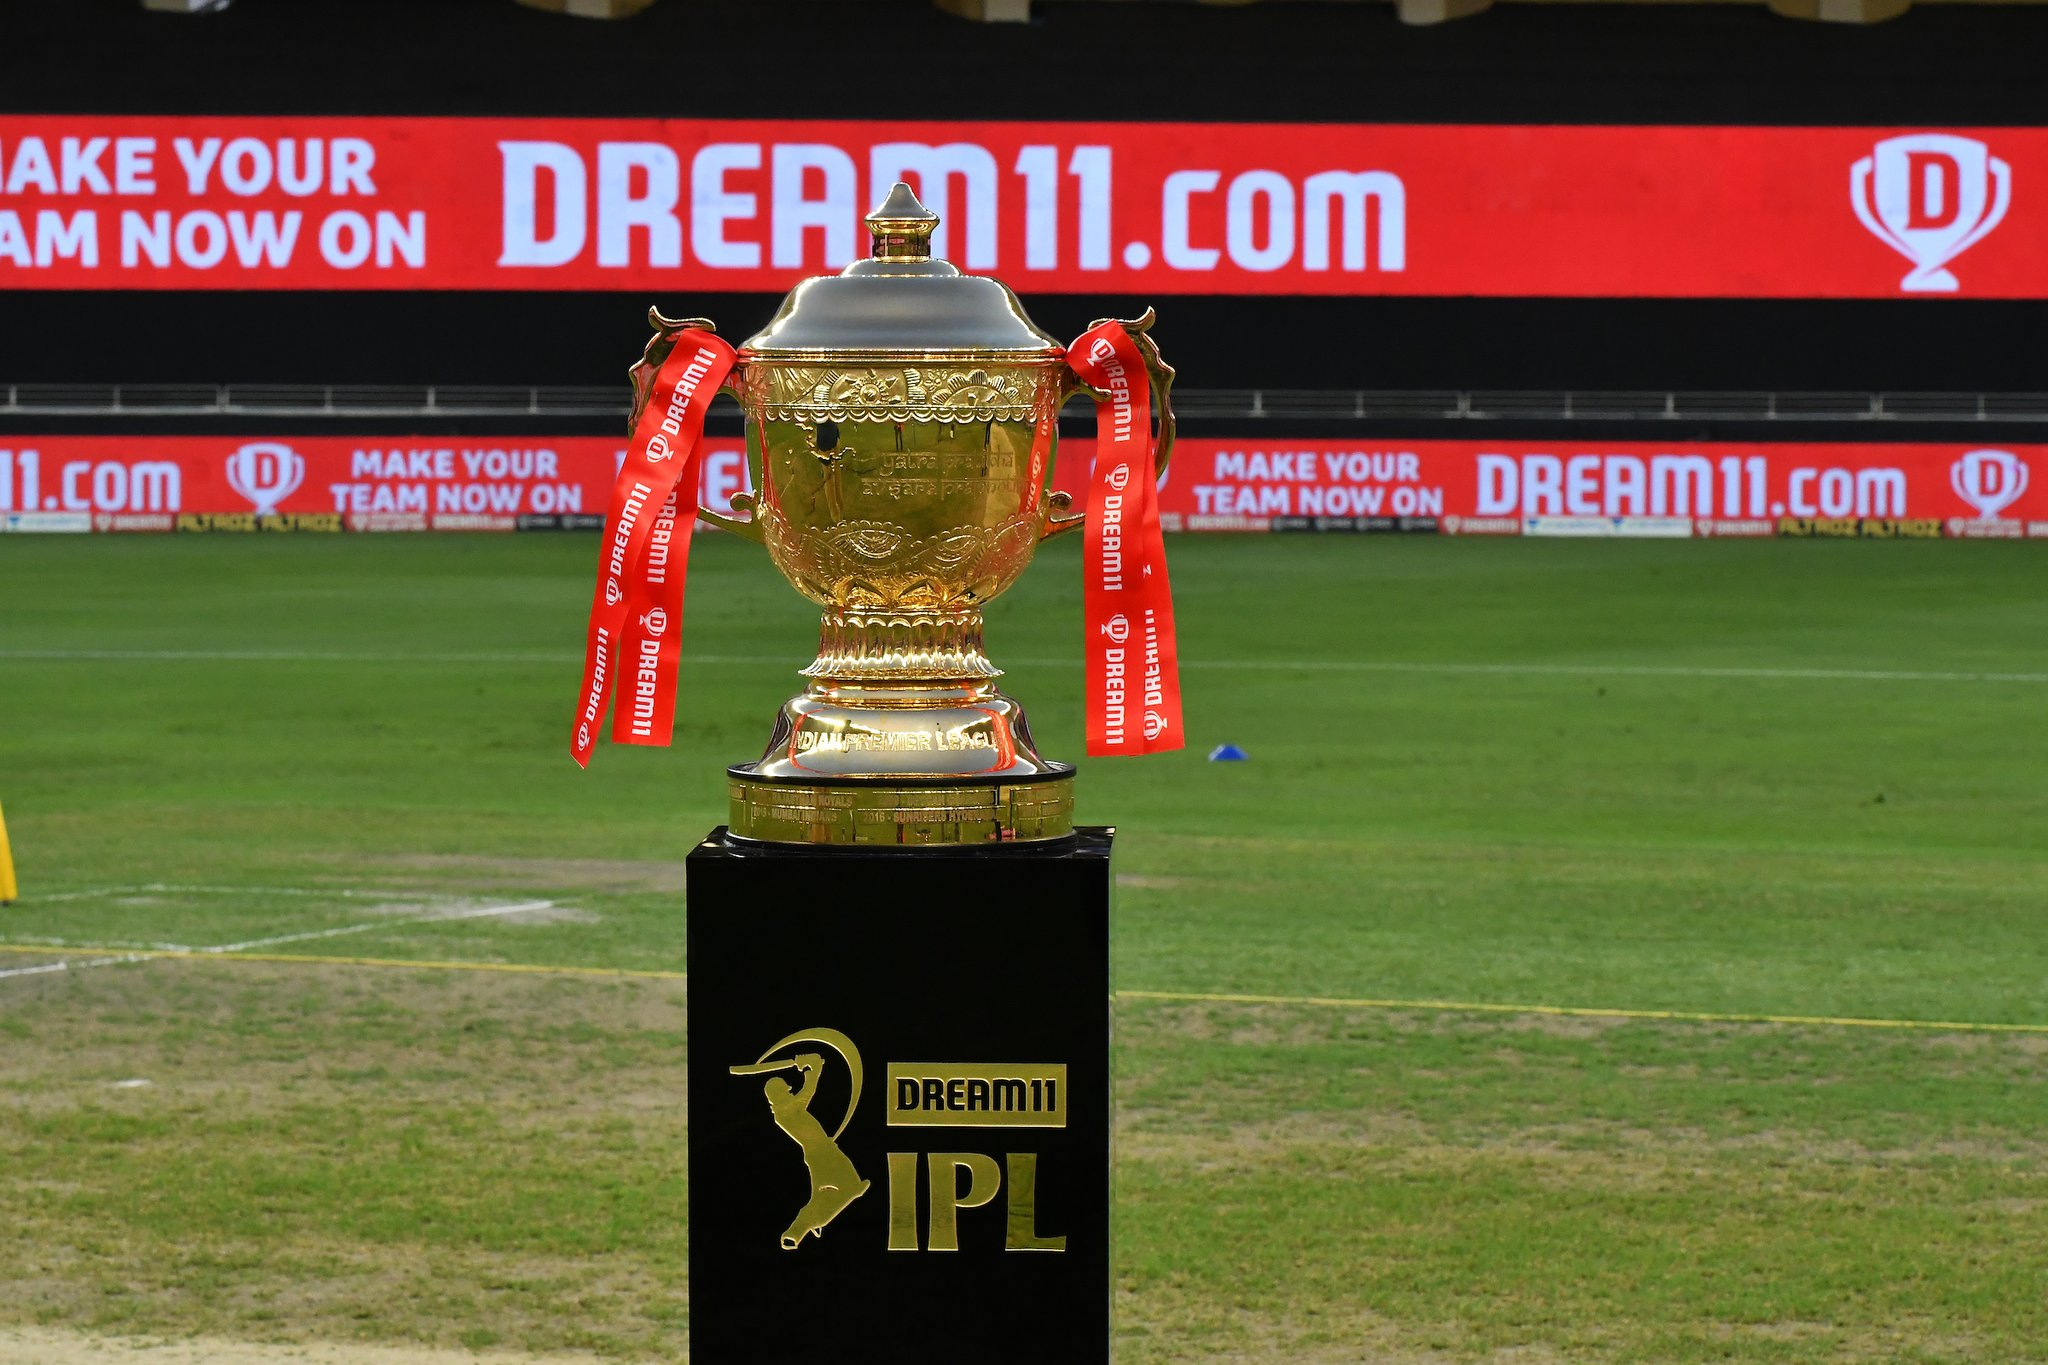 Dream 11 IPL trophy | IPL Twitter